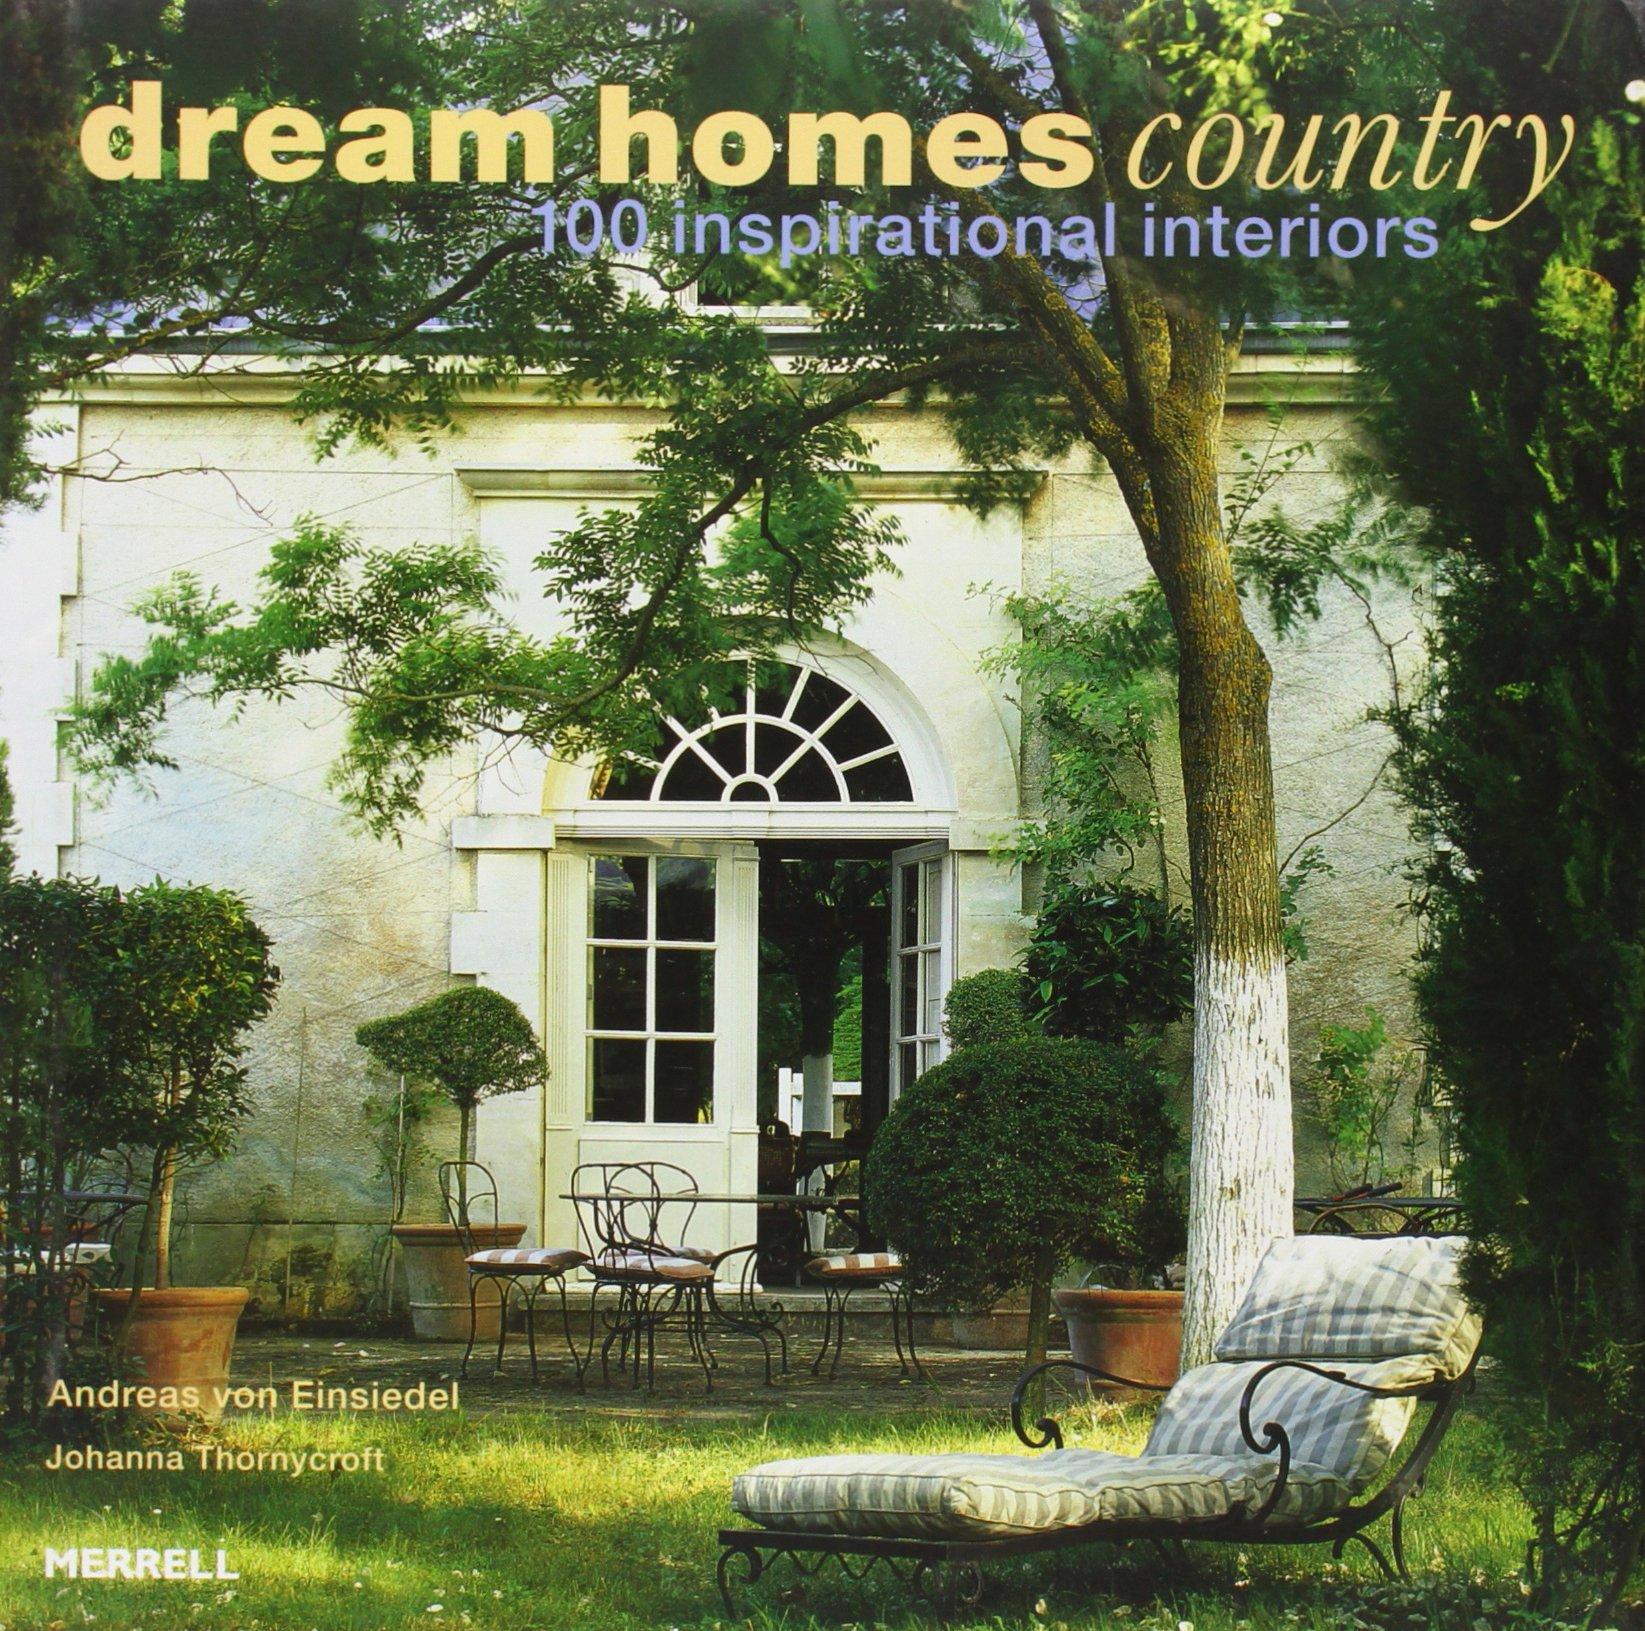 dream homes country 100 inspirational interiors andreas von einsiedel johanna thornycroft 8601423123646 amazoncom books